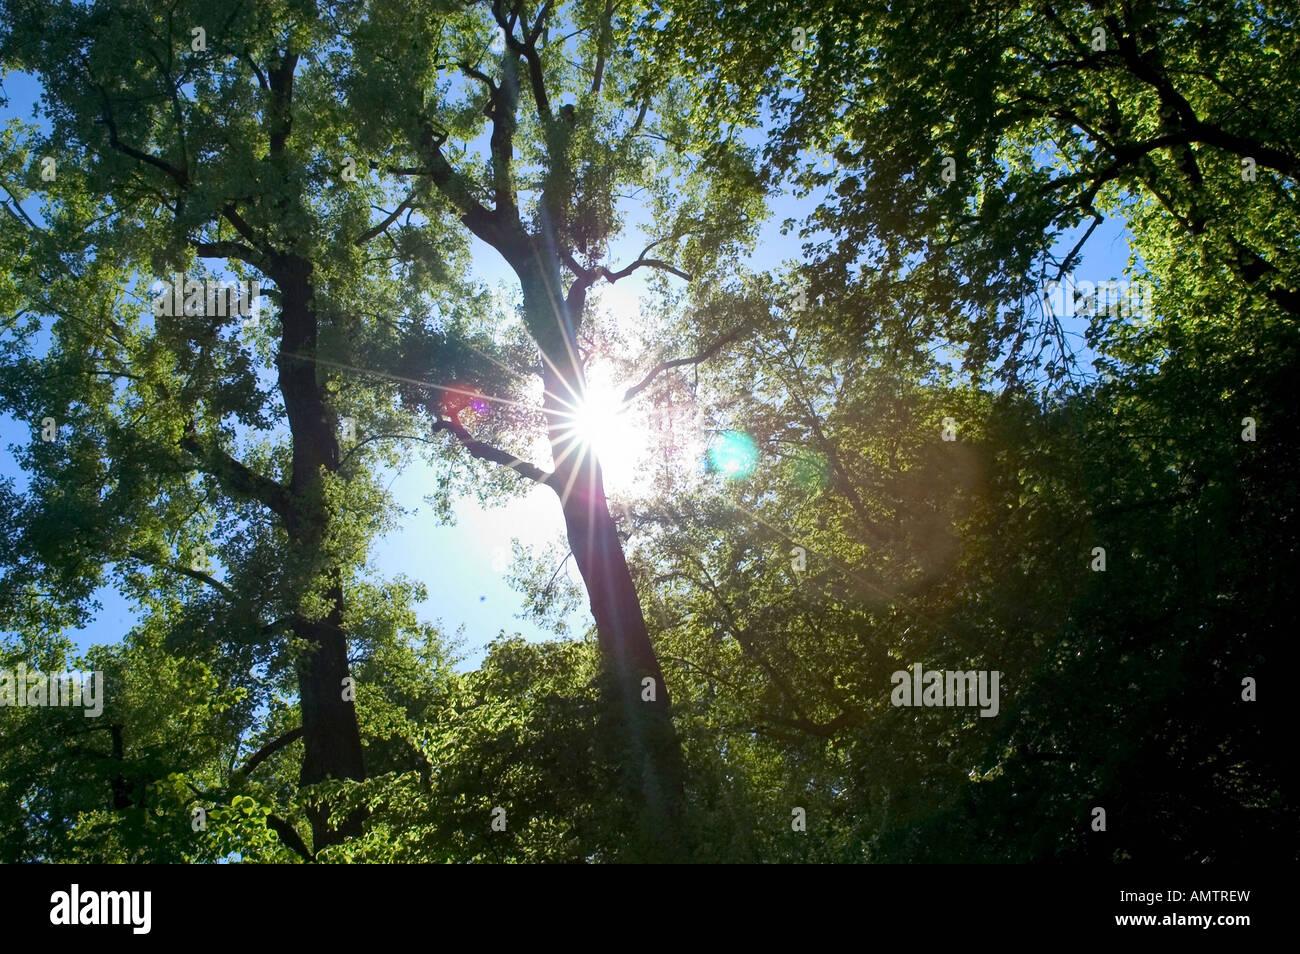 Sun shining through treetops - Stock Image